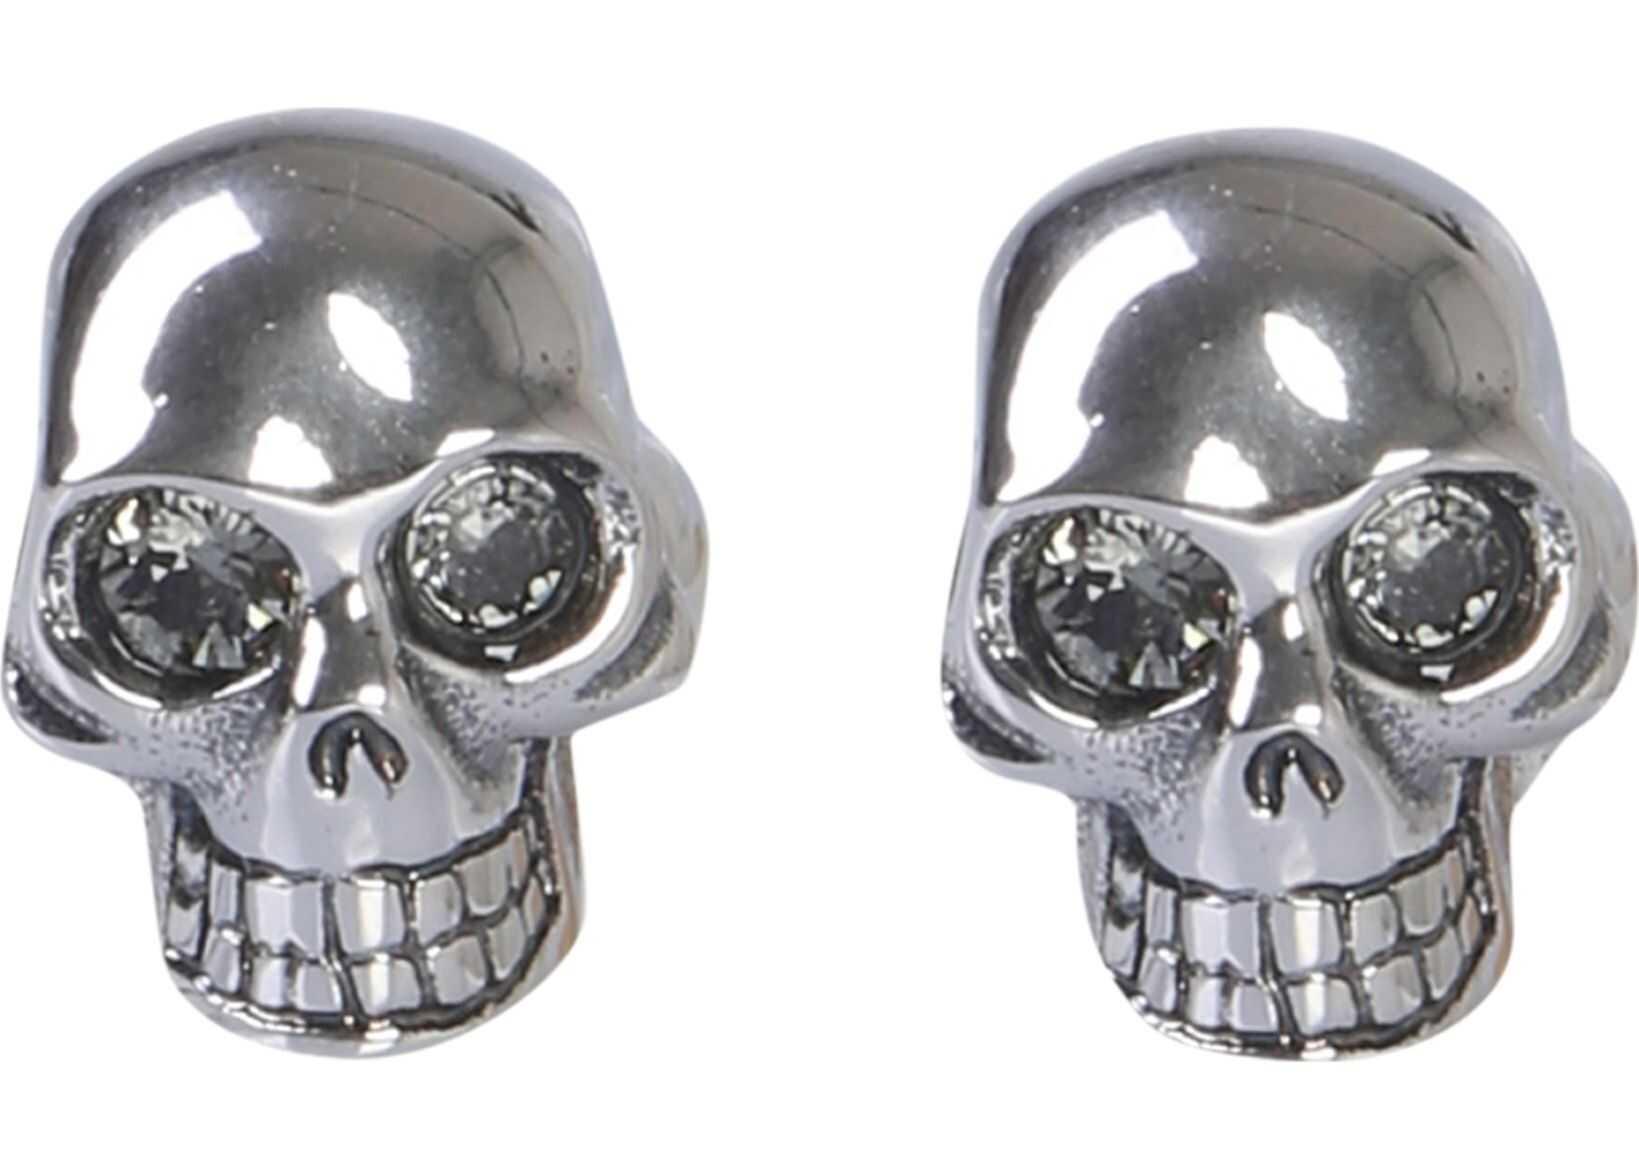 Alexander McQueen Skull Cufflinks GREY